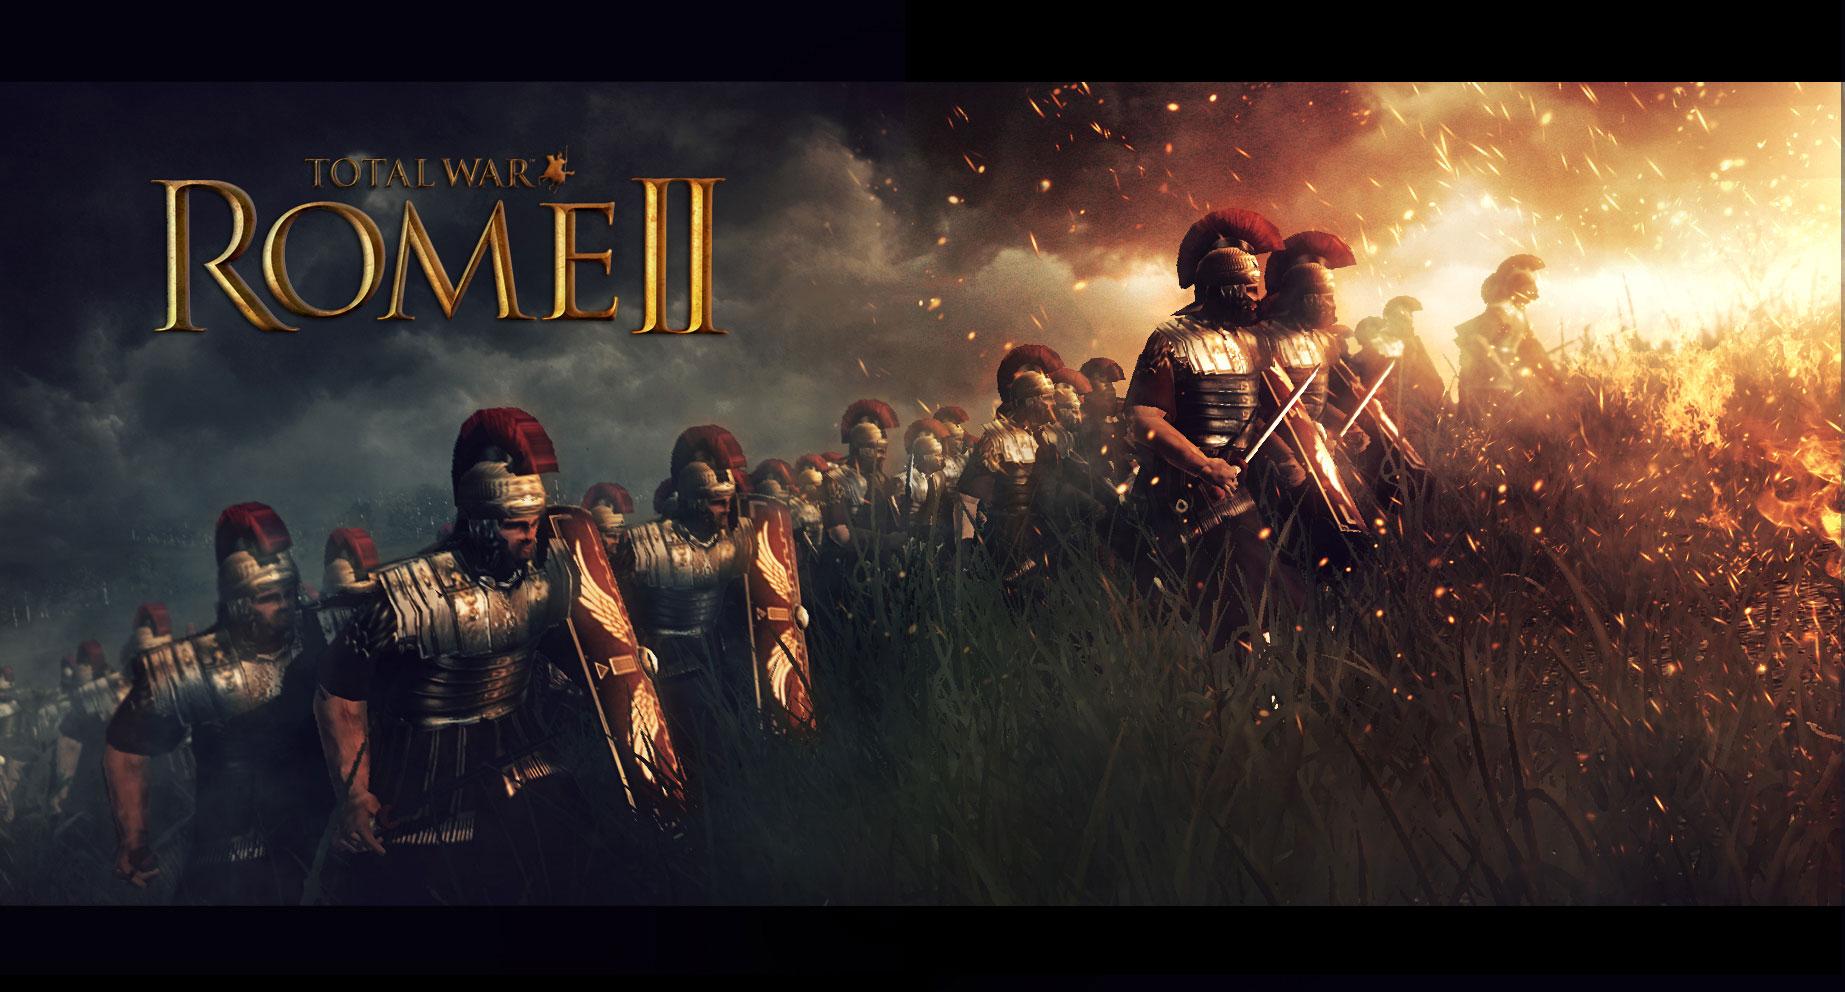 Rome-Total-War-2-Wallpaper.jpg